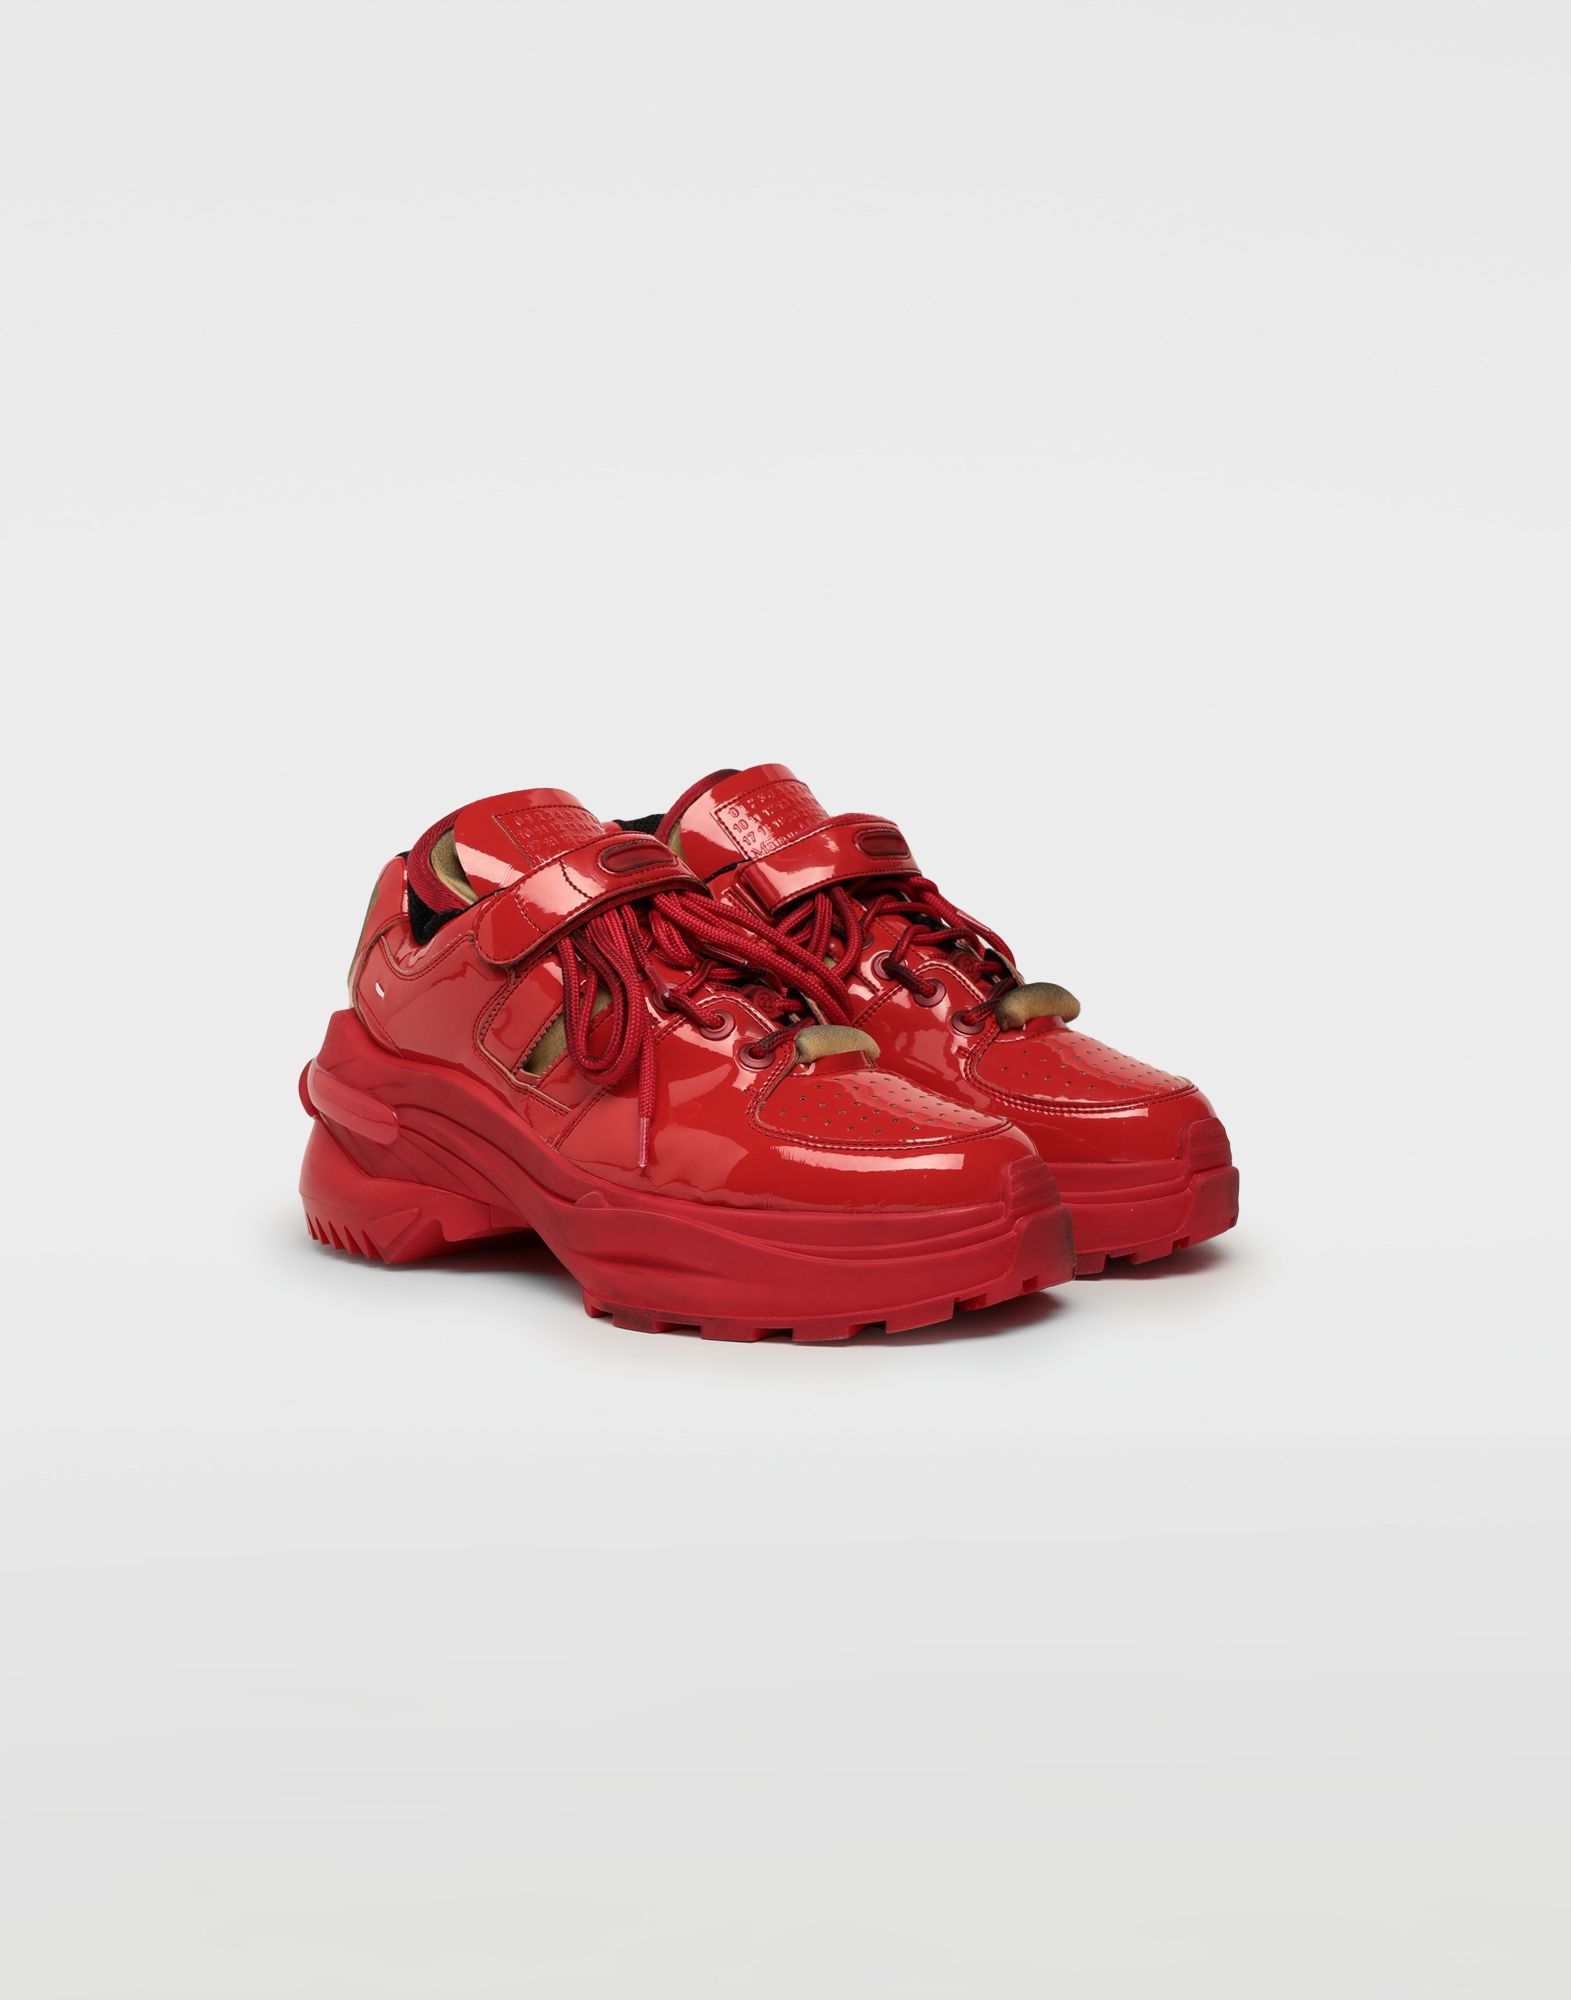 MAISON MARGIELA Retro Fit laminated low top sneakers Sneakers Man r